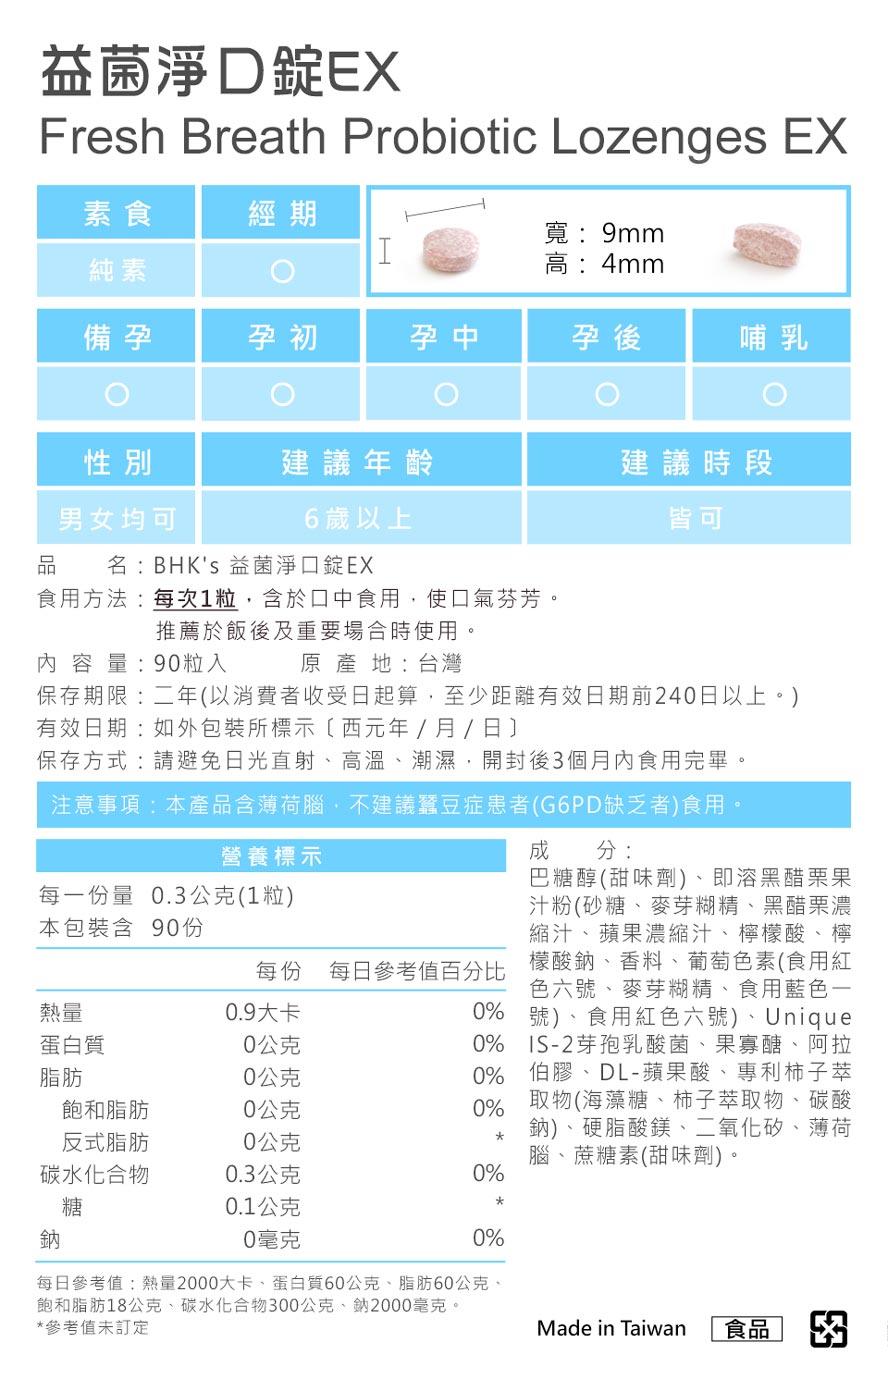 BHK's益菌淨口錠為純素保健食品,產品皆經安全檢驗合格,請安心食用。